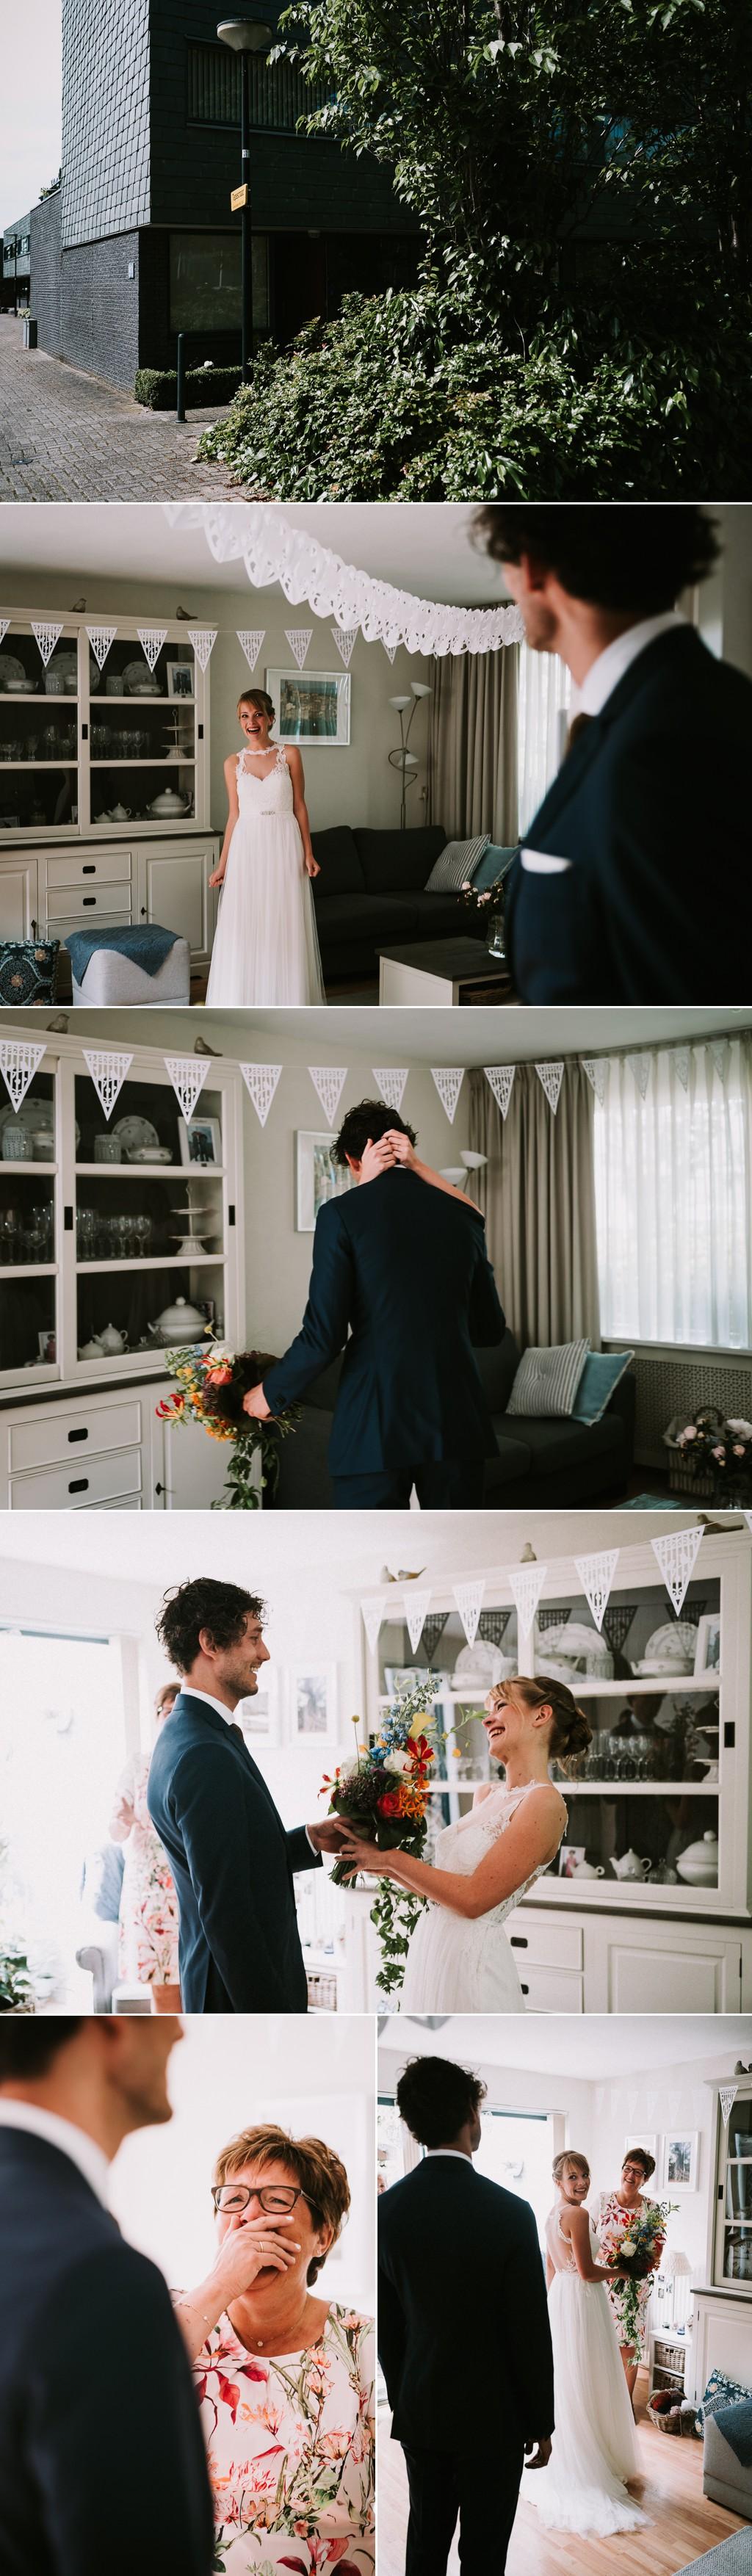 trouwfotograaf-rotterdam-trouwen-in-het-bos-arnhem-fotografie-steef-utama-w-w-01